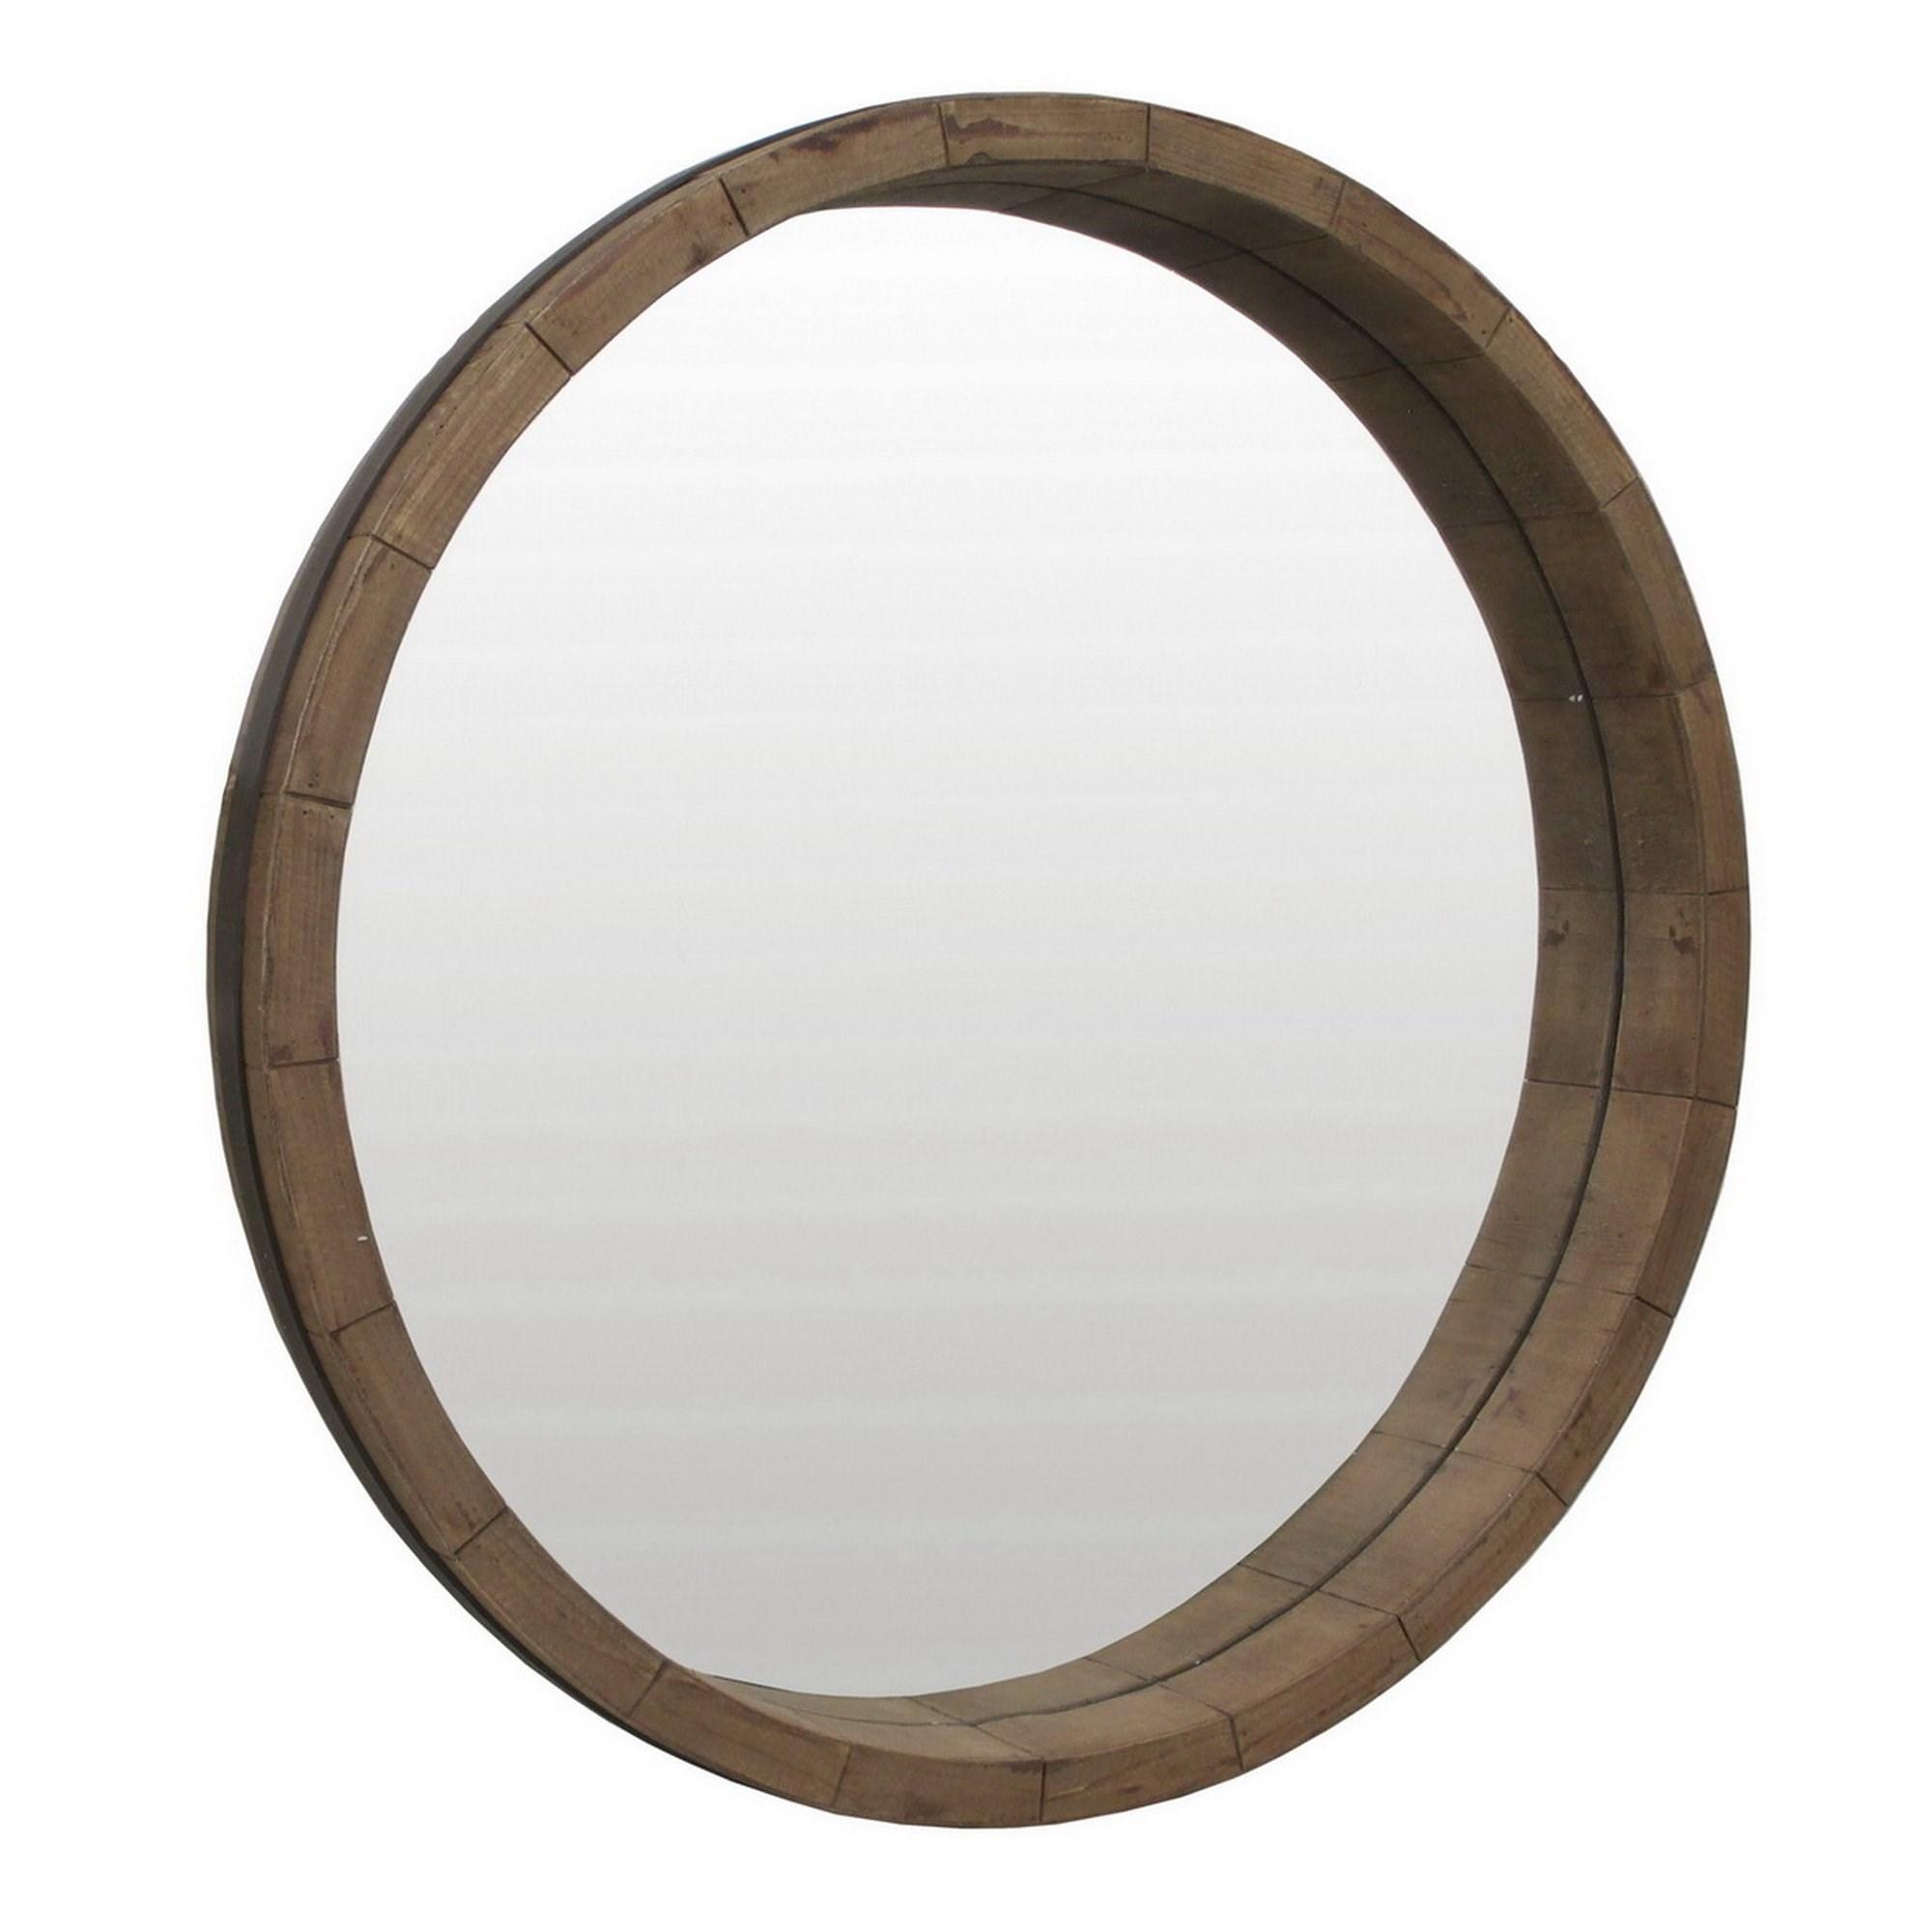 Round Wood Framed Mirror Bassman Blaine La Mart